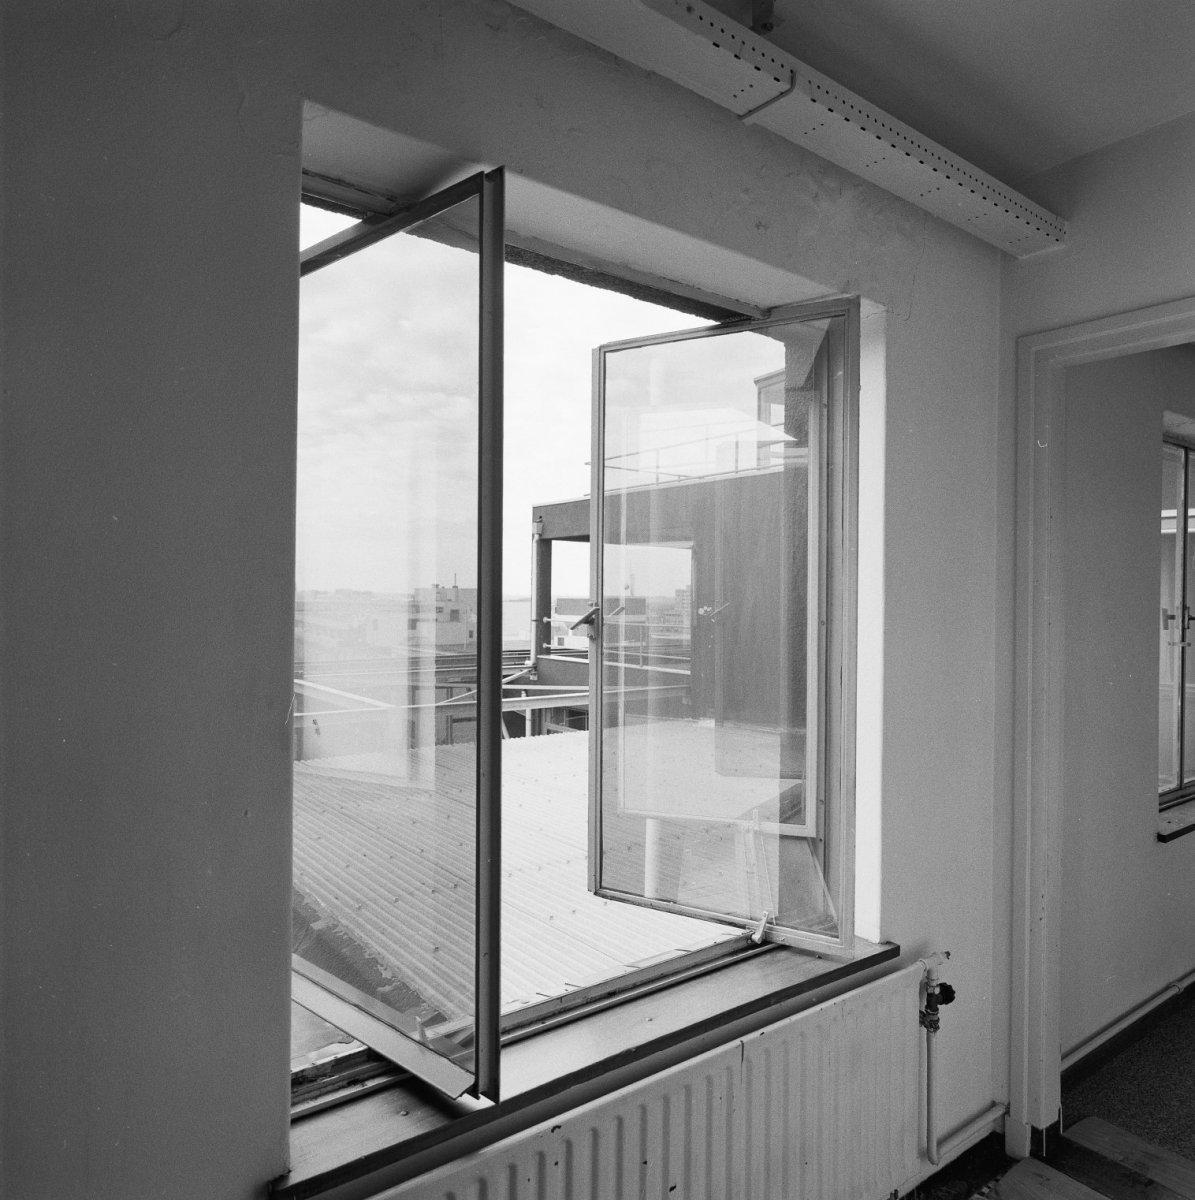 File interieur penthouse metalen raamkozijn draairaam heerlen 20001030 - Dachwohnung interieur penthouse ...